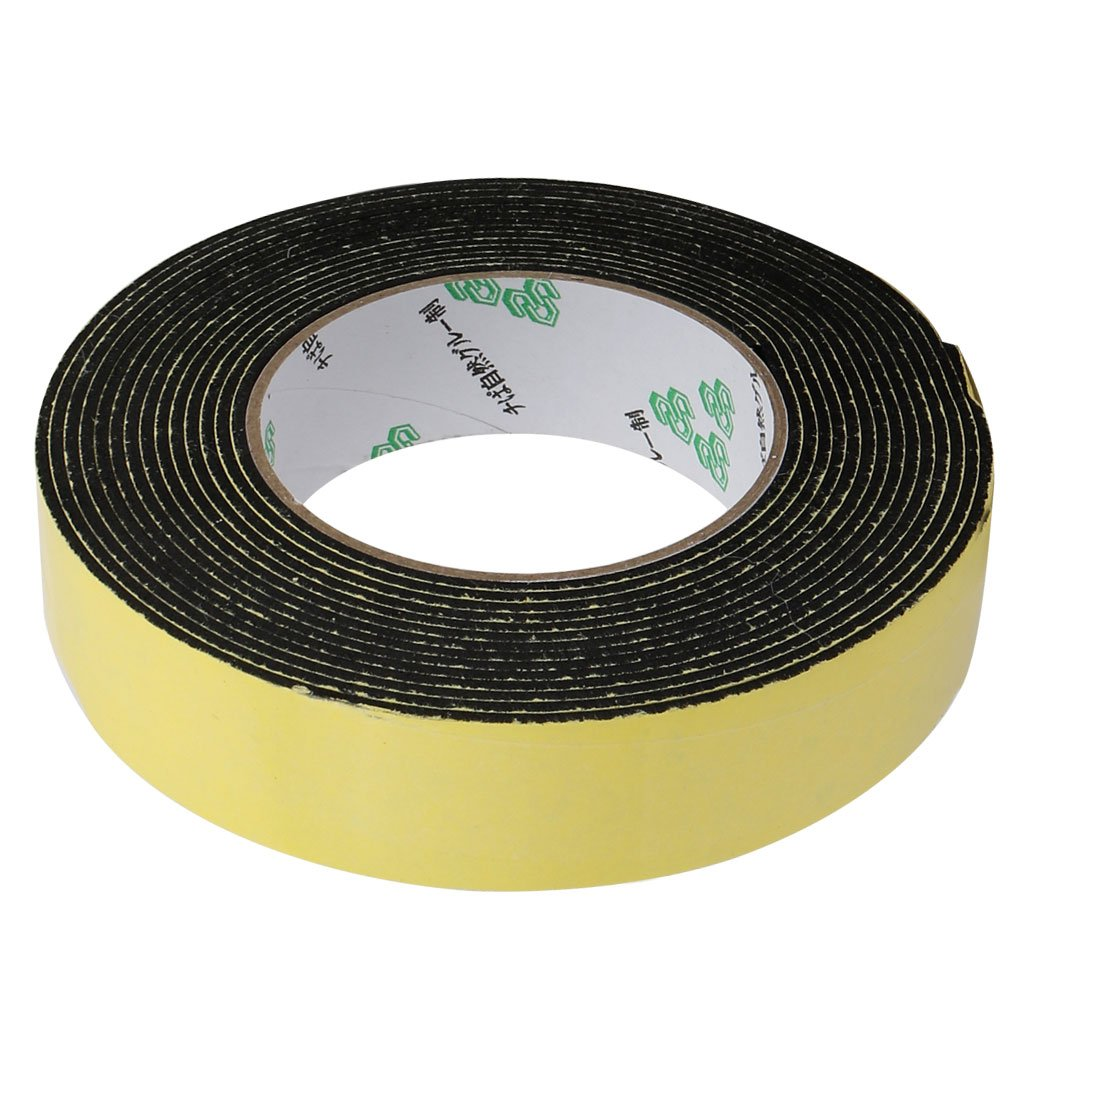 /9,8/cm longitud 30/mm x 2/mm sola cara cinta adhesiva a prueba de golpes EVA Esponja Amarillo Sourcingmap/